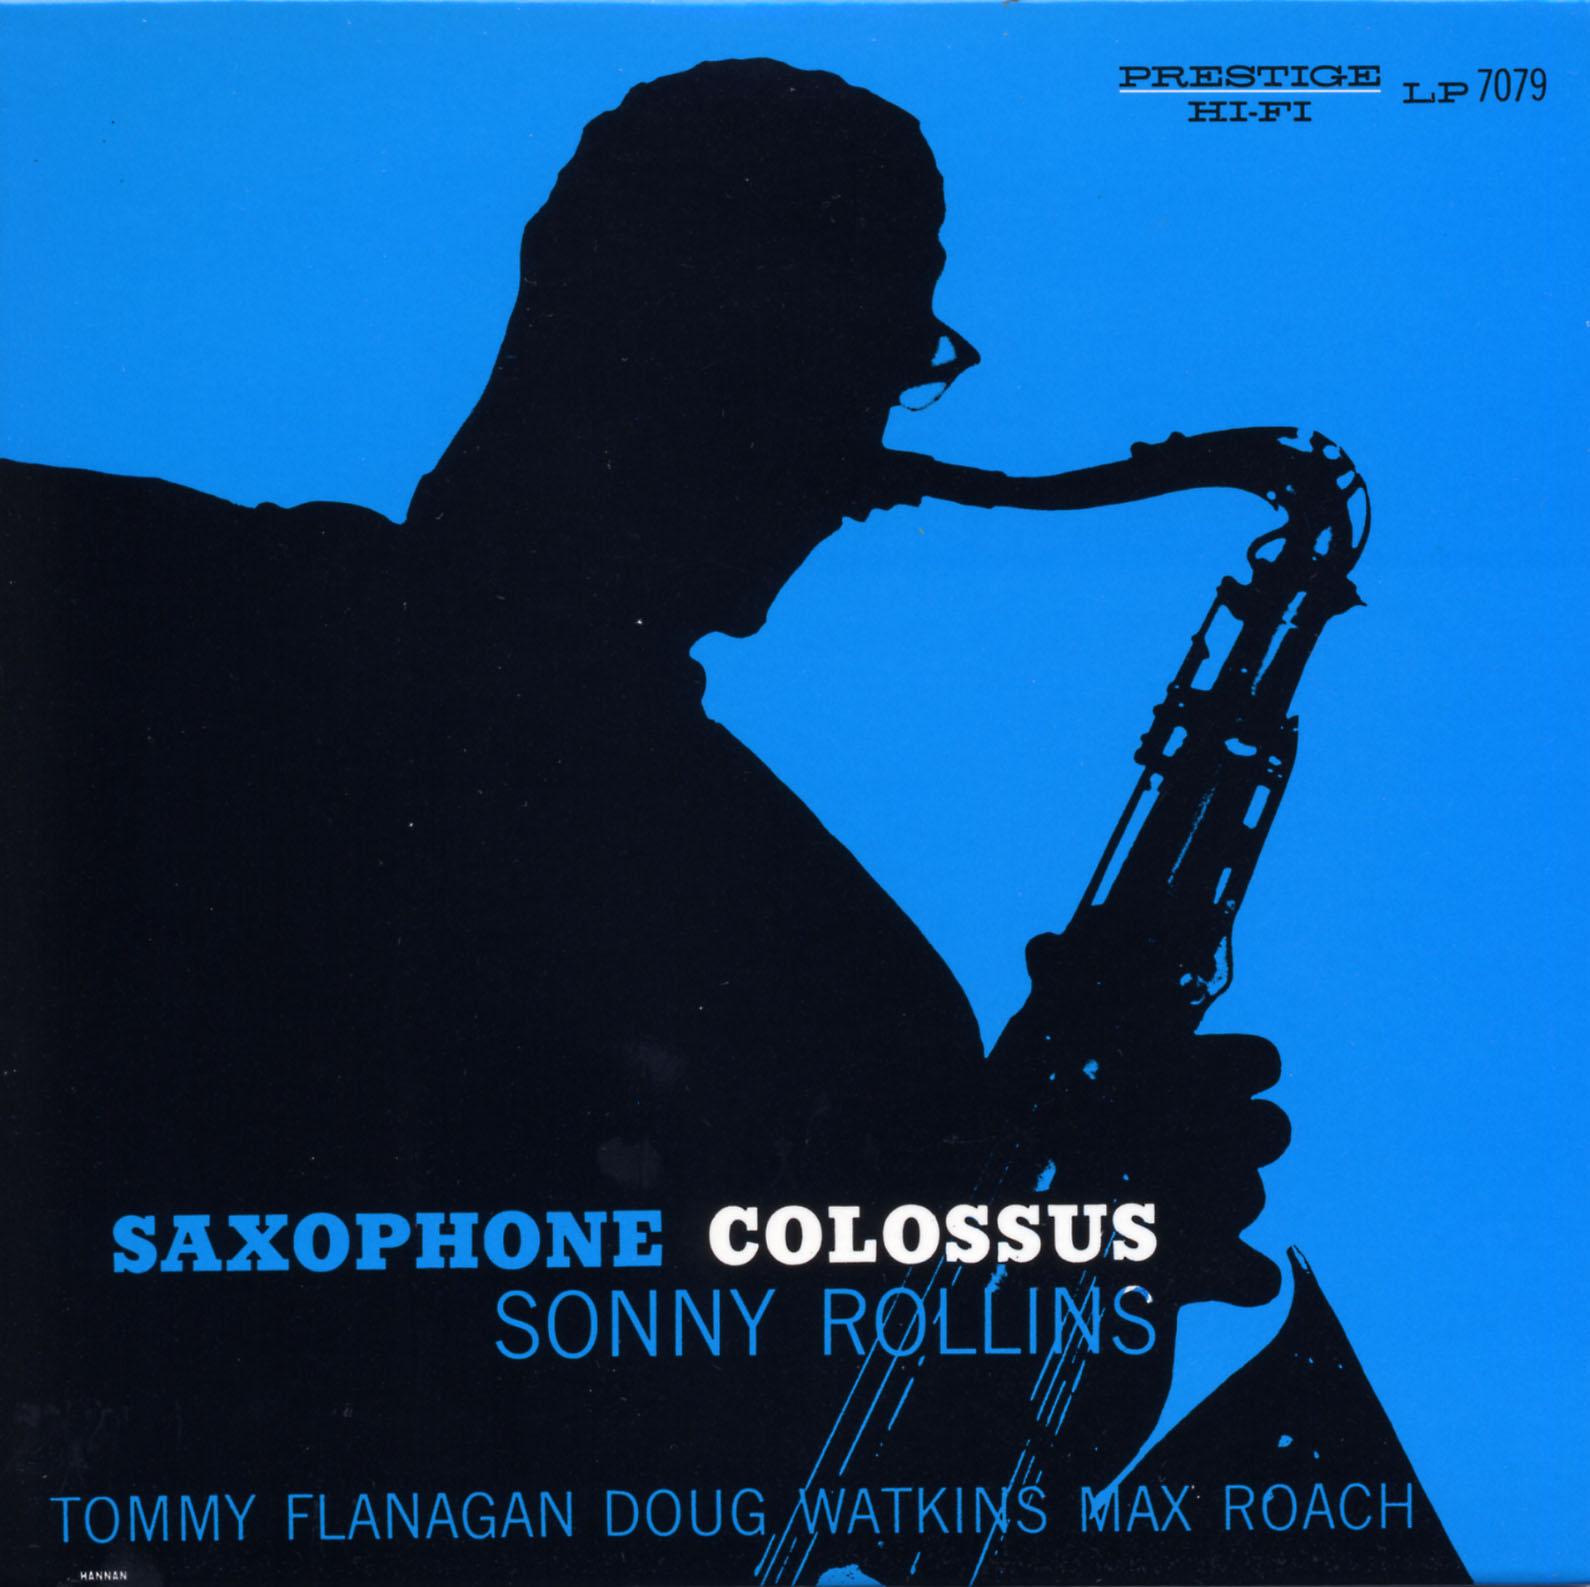 Sonny-Rollins_Saxophone-Colossus.jpg